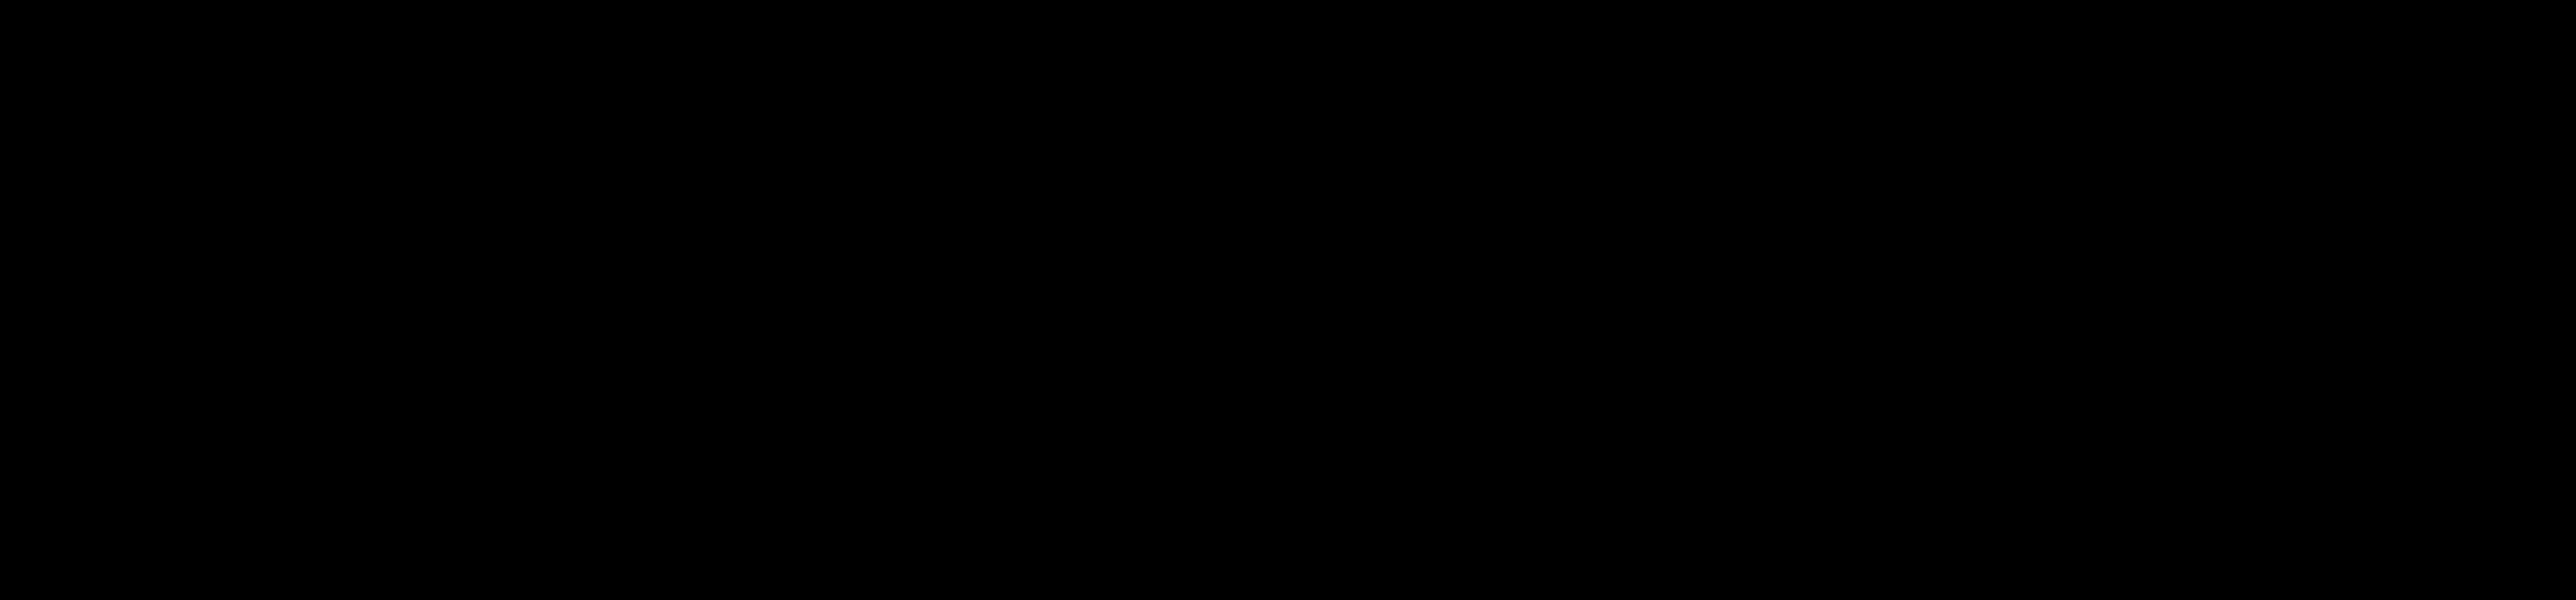 N-Biotinyl-4,7,10-trioxa-1,13-tridecanediaminetrifluoroacetate